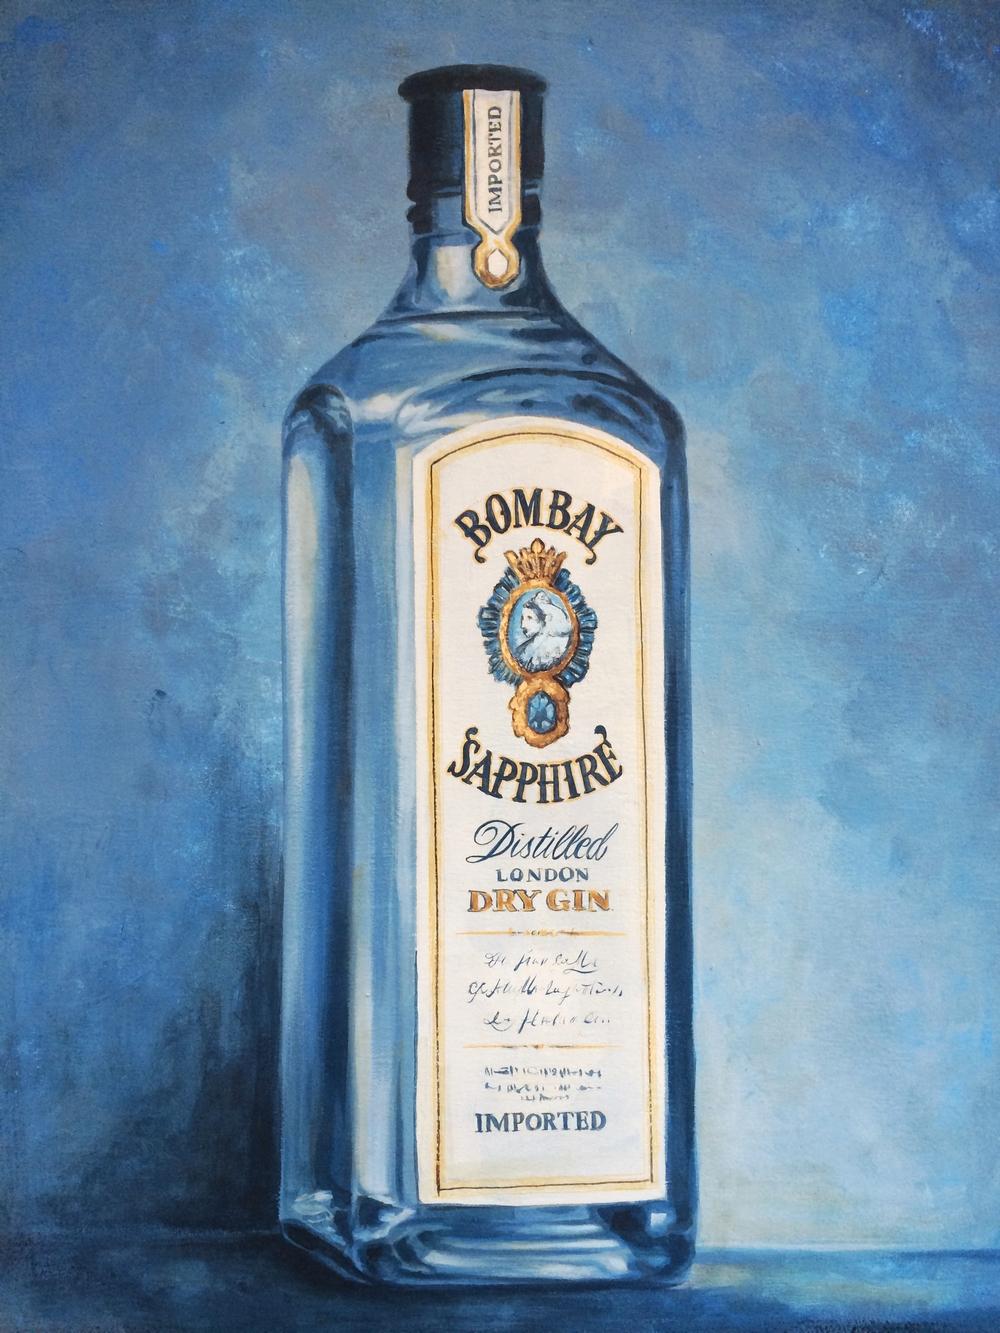 bombay saphire illustration.JPG